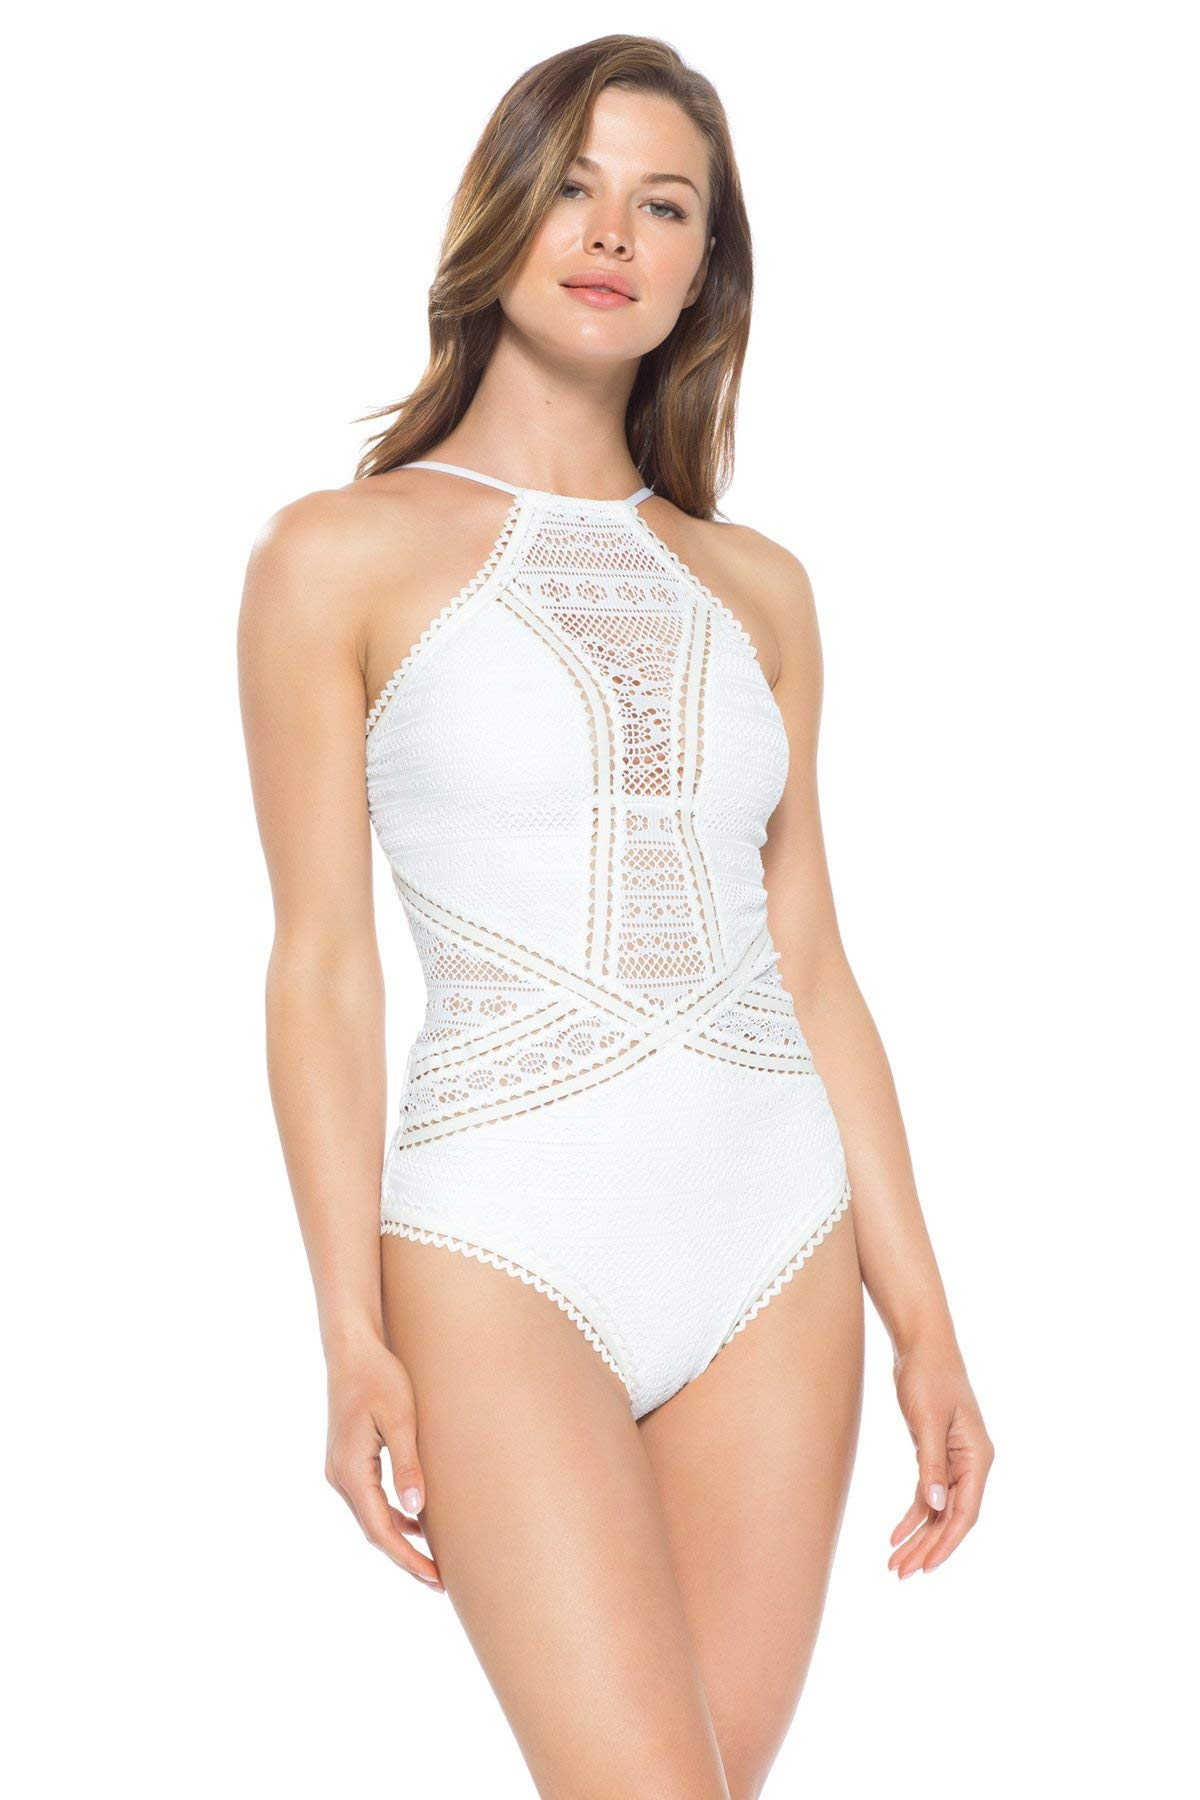 Becca Rebecca Virtue Rickrack Swimsuit